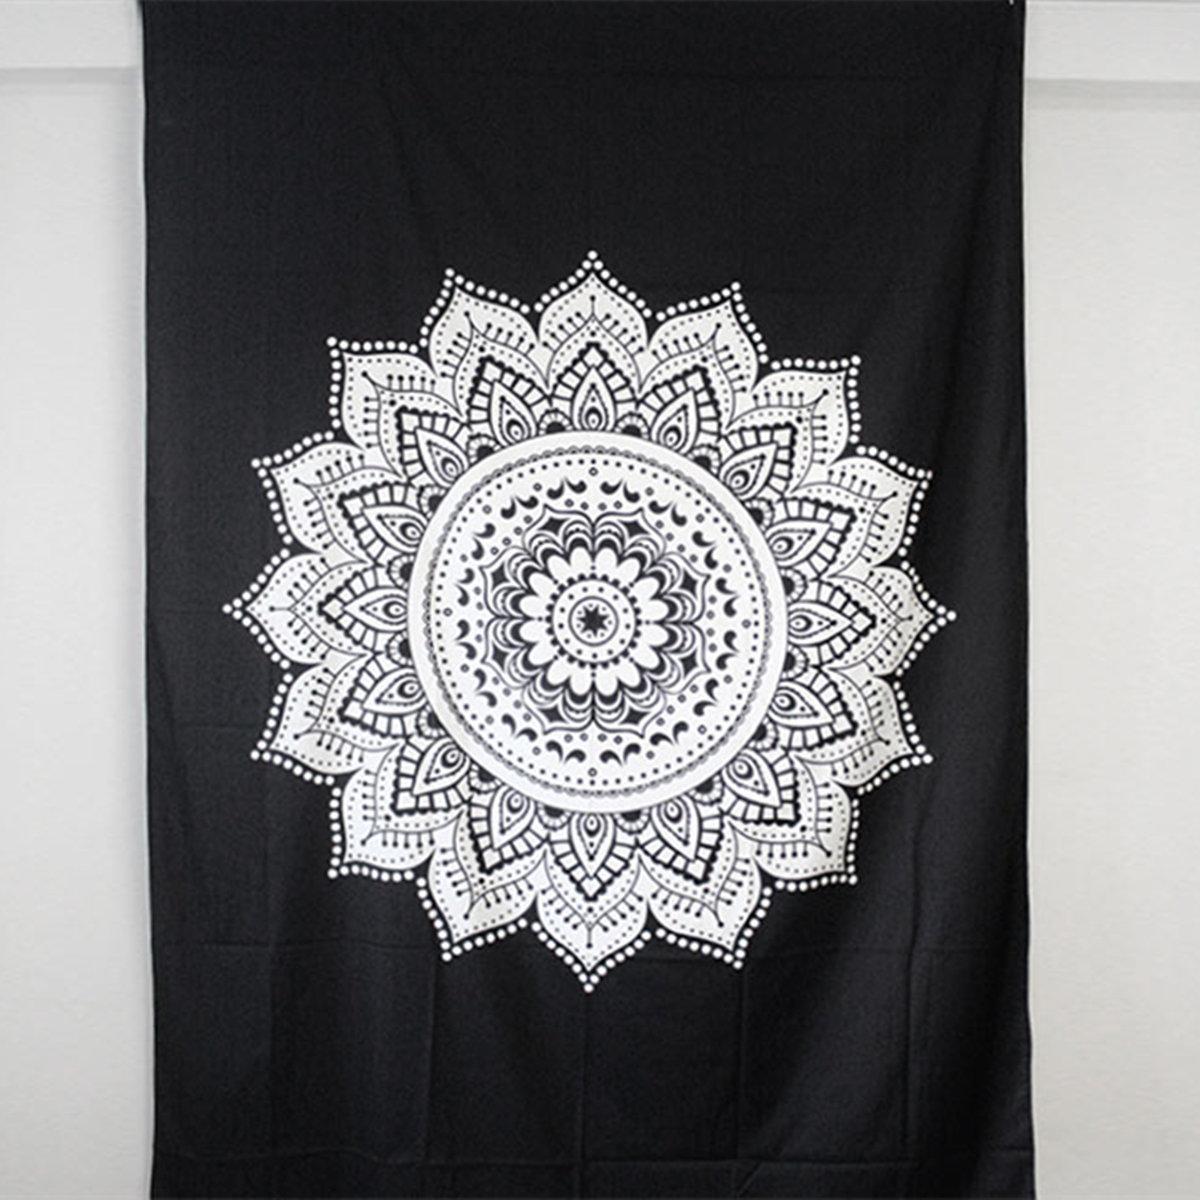 210X148cm Bohemian Bedspread Indian Ethnic Mandala Wall Hanging Hippie Tapestry Dorm Decor